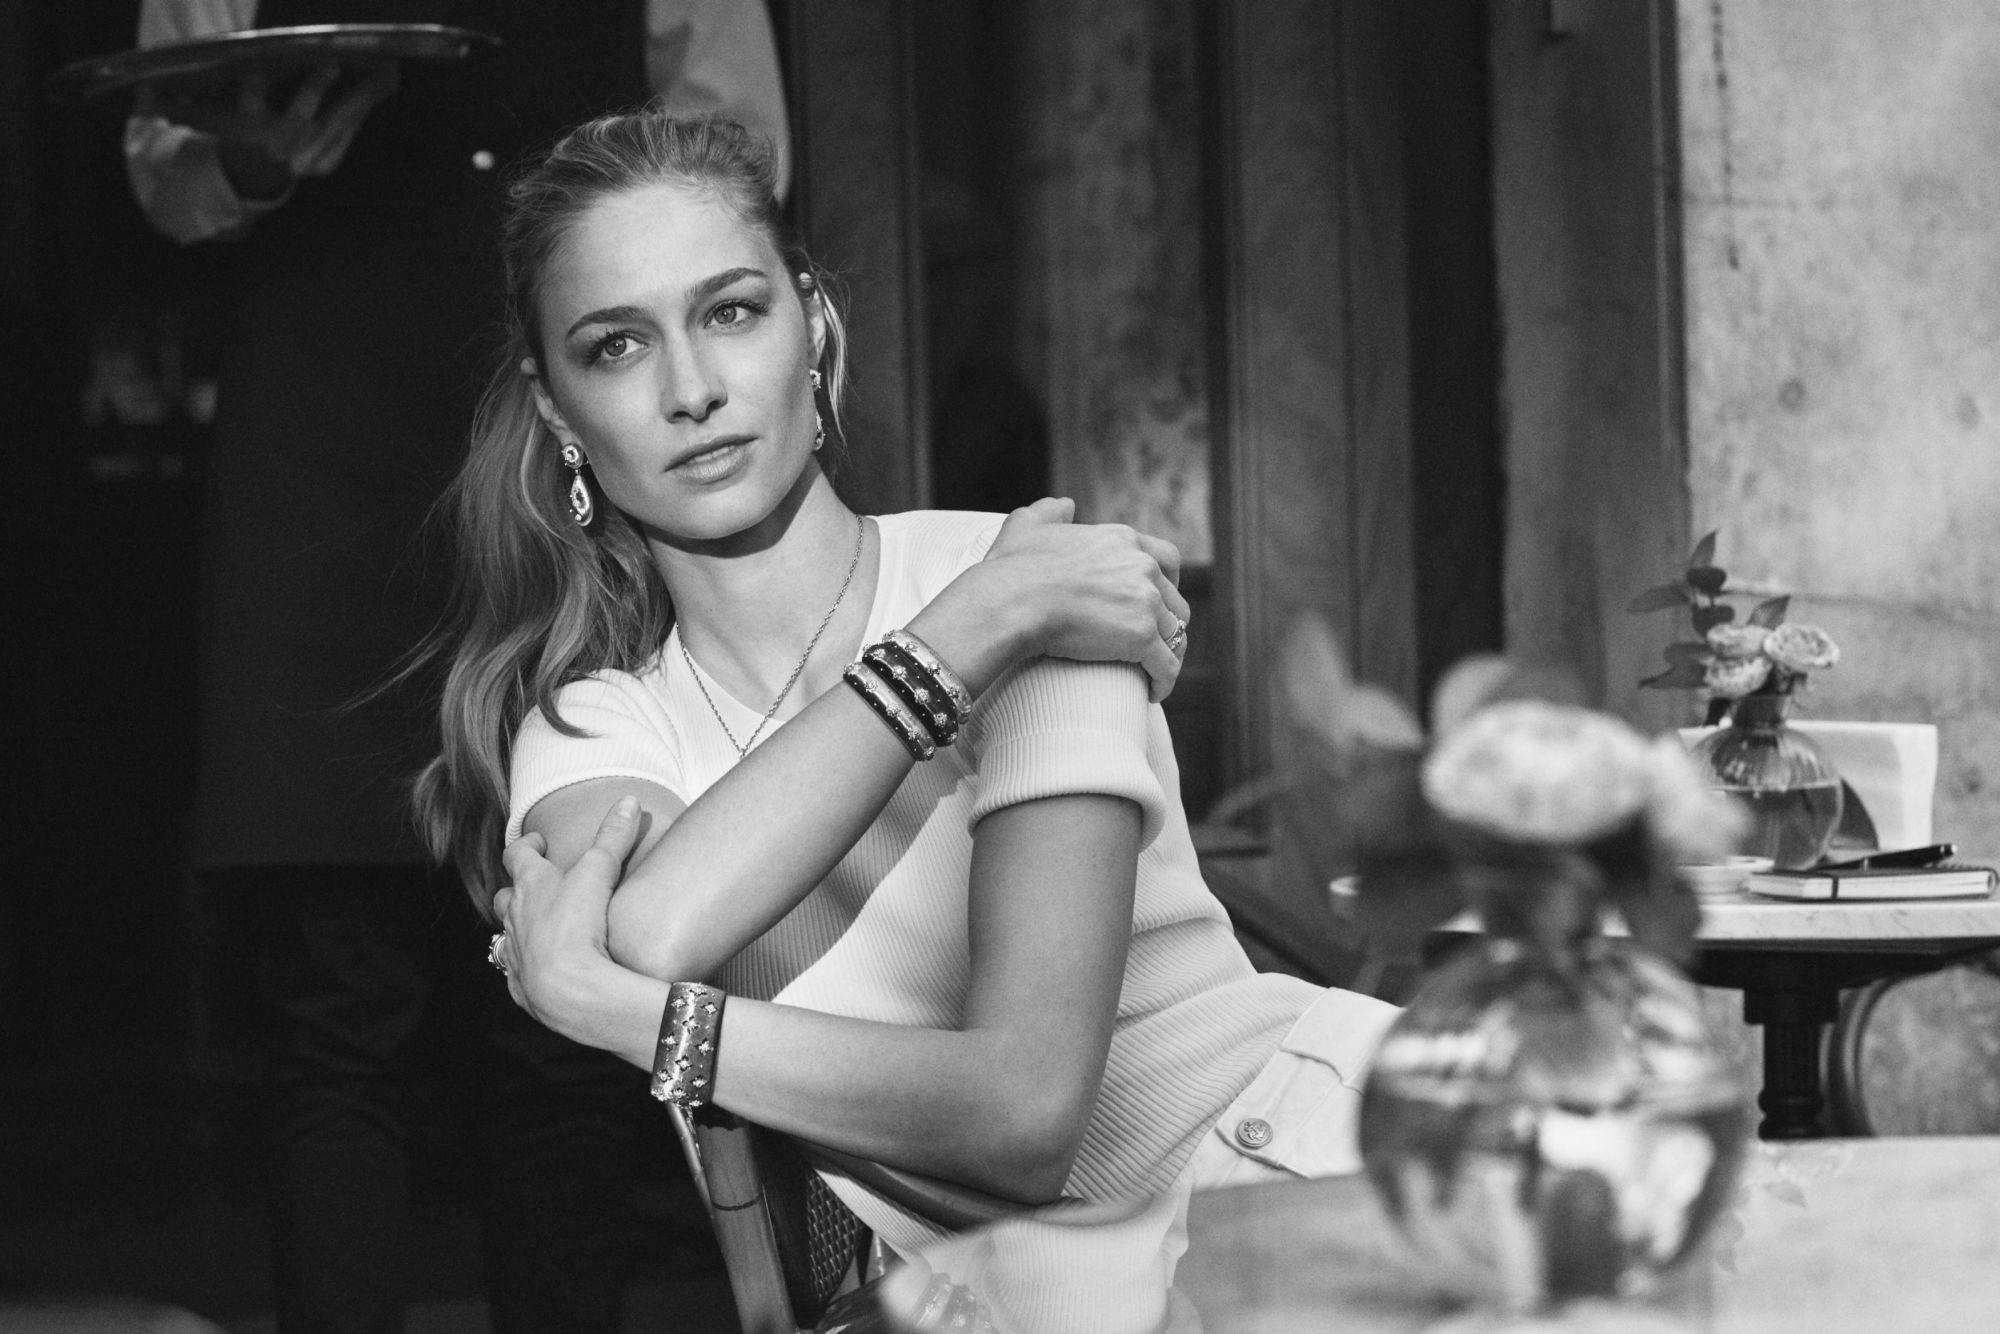 摩納哥王妃Beatrice Borromeo